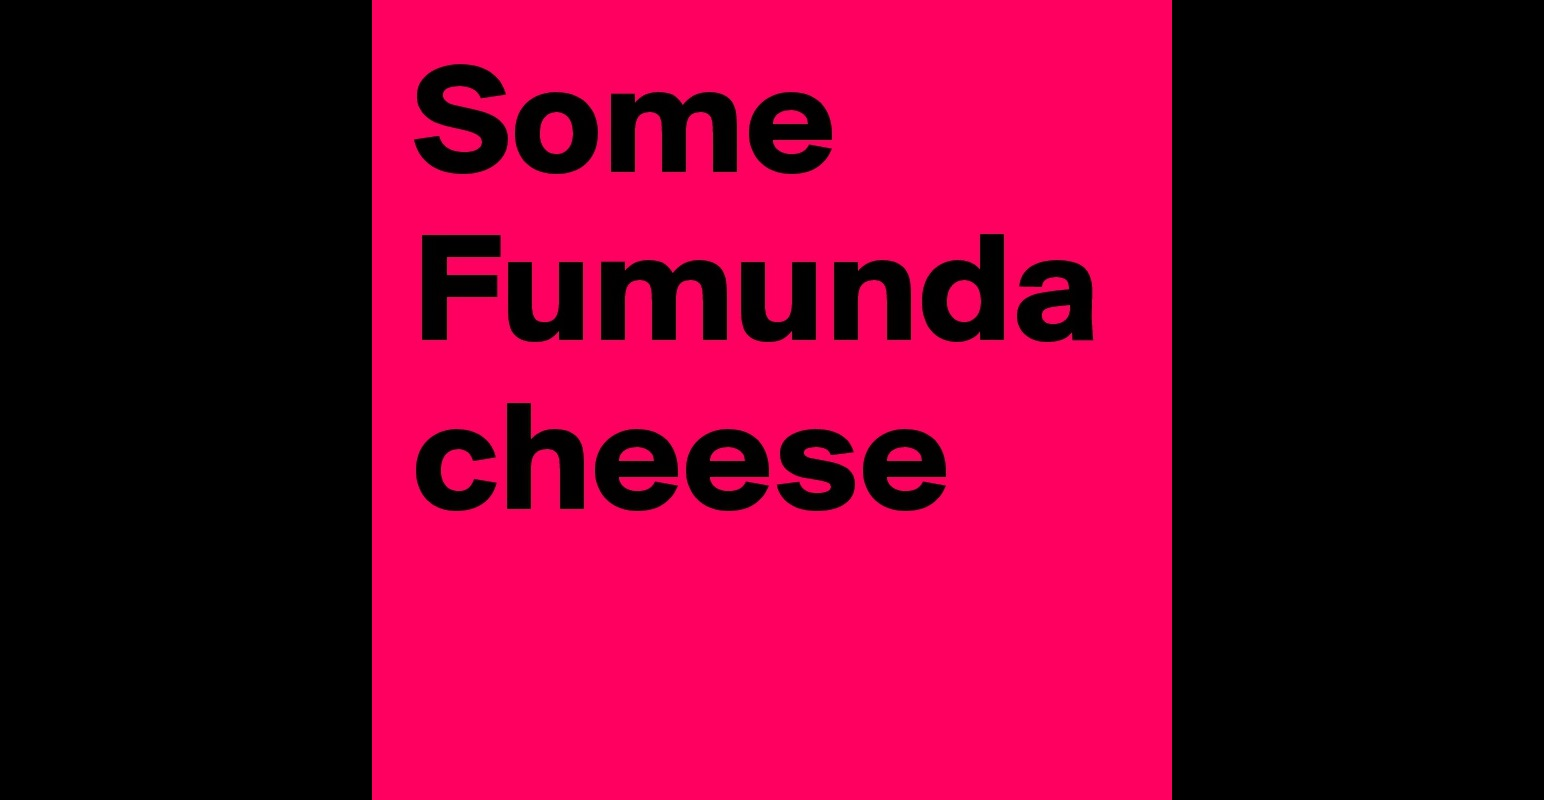 fumunda cheese